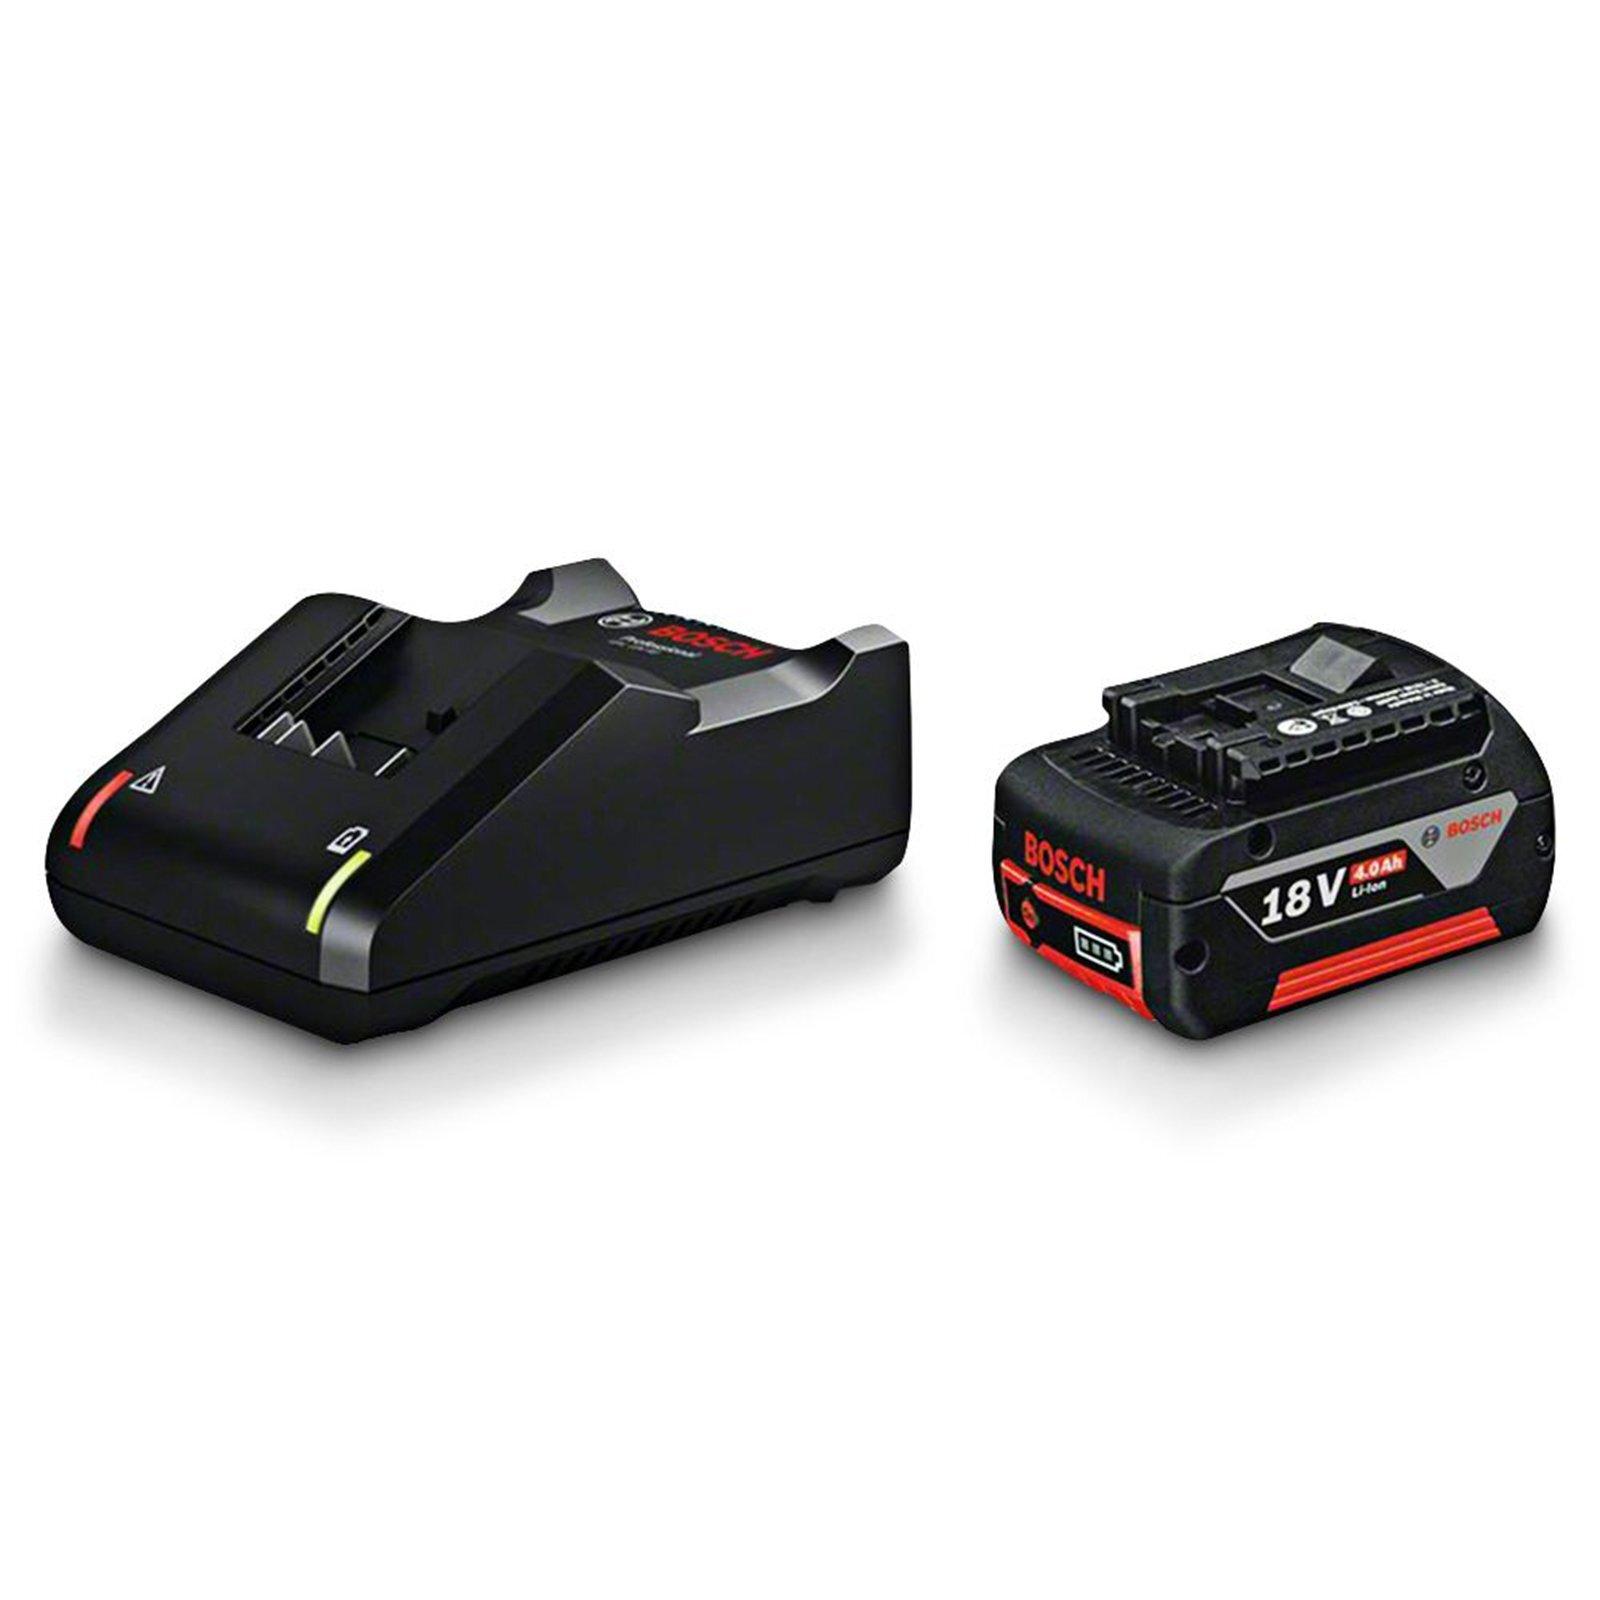 Bosch Blue 18V 4.0AH Battery And Charger Starter Kit